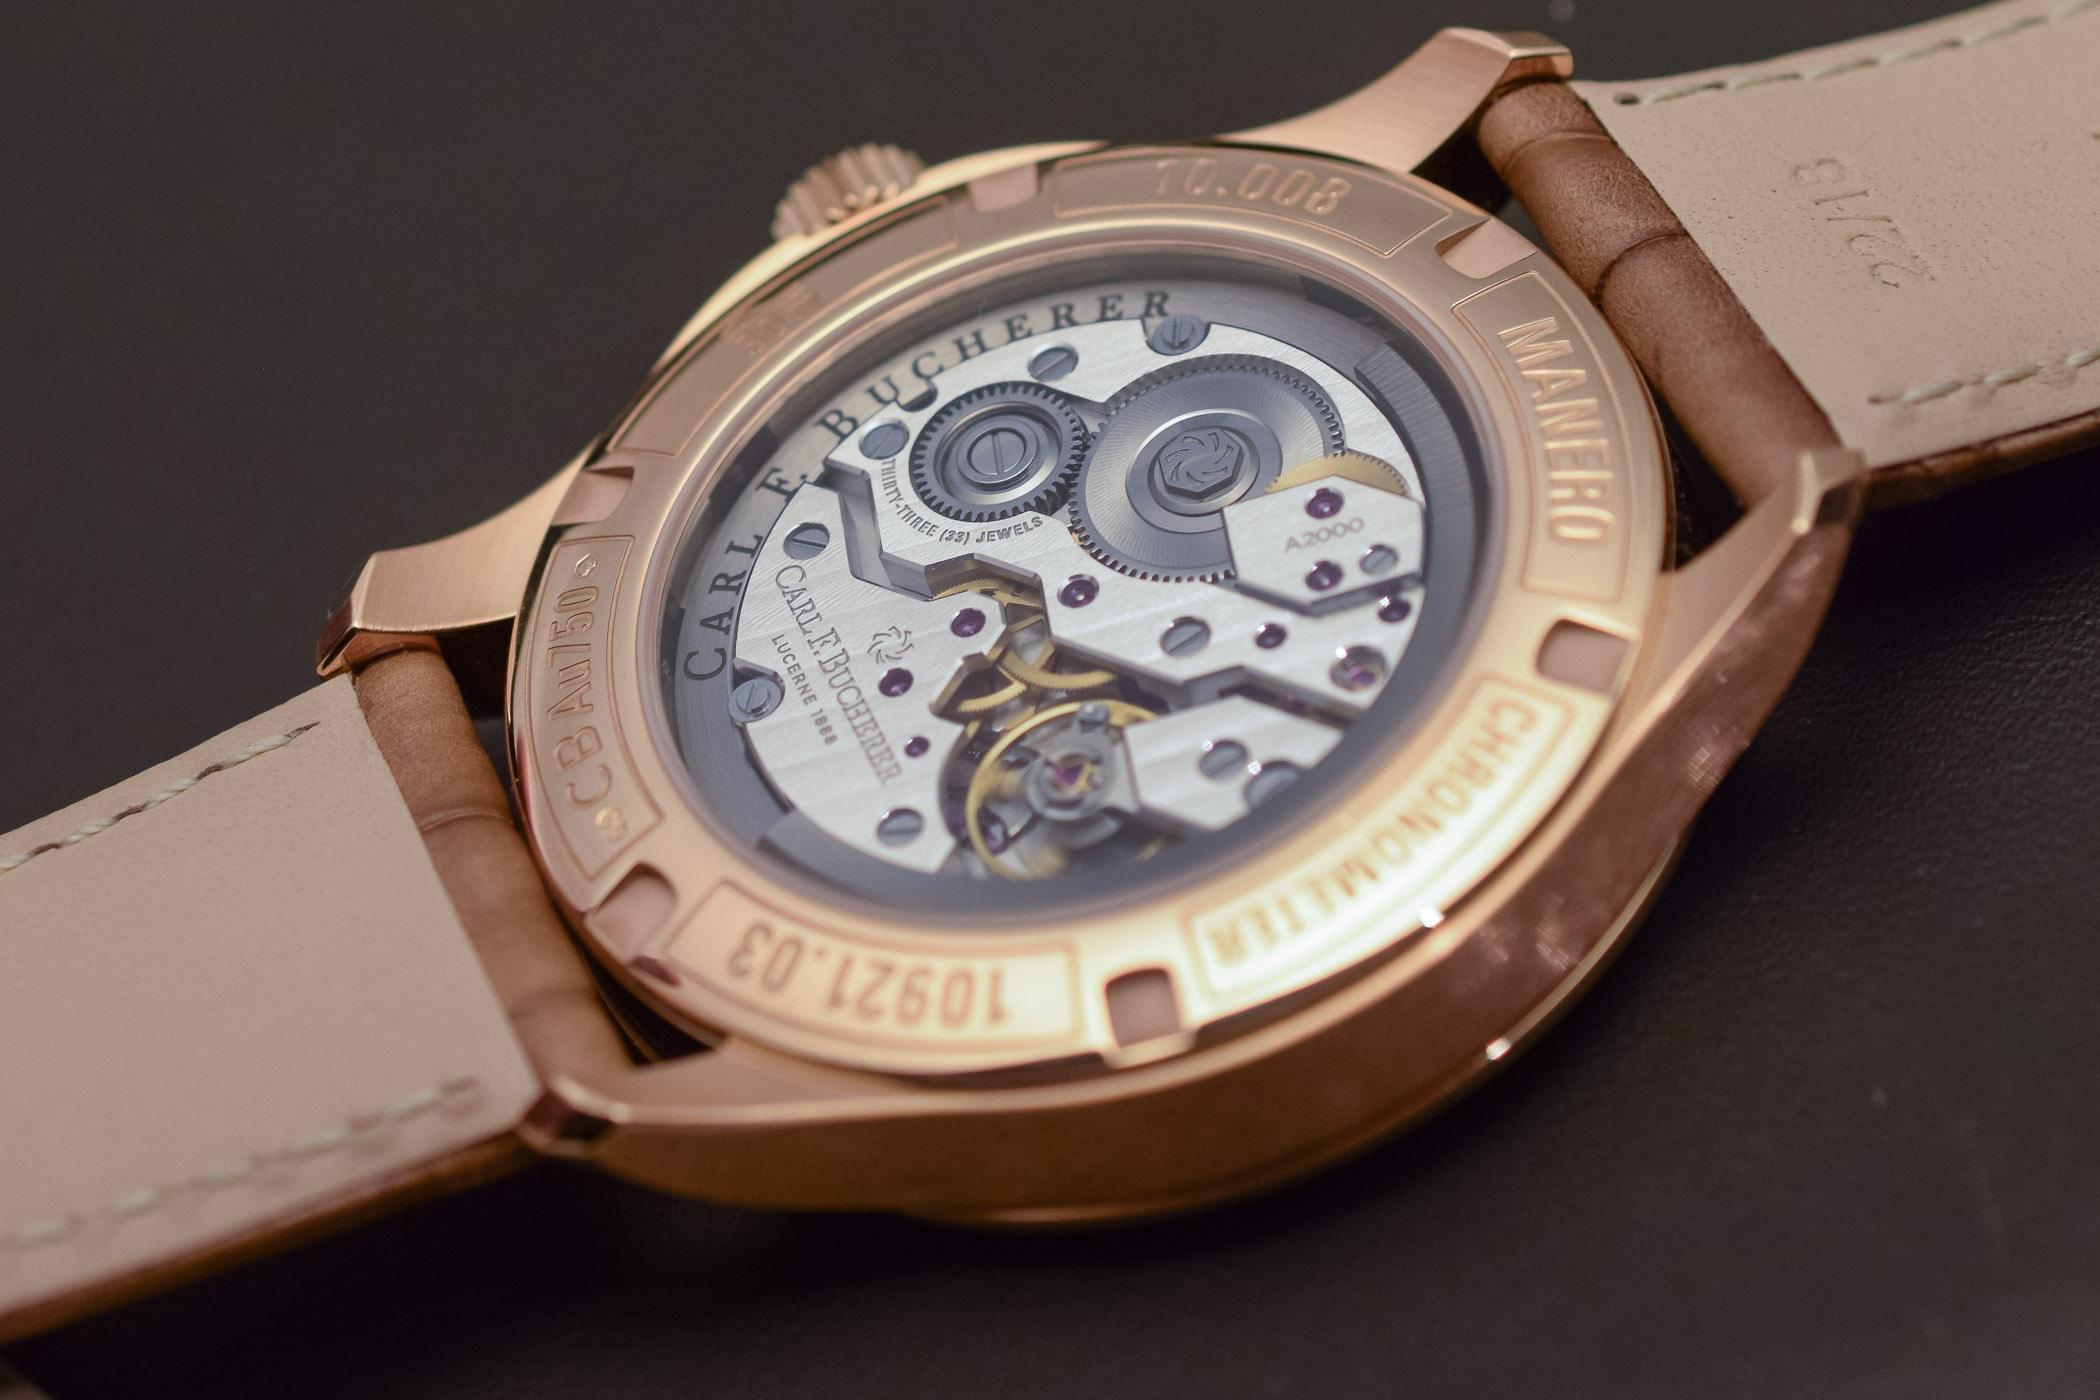 Carl F. Bucherer Manero Peripheral 43mm